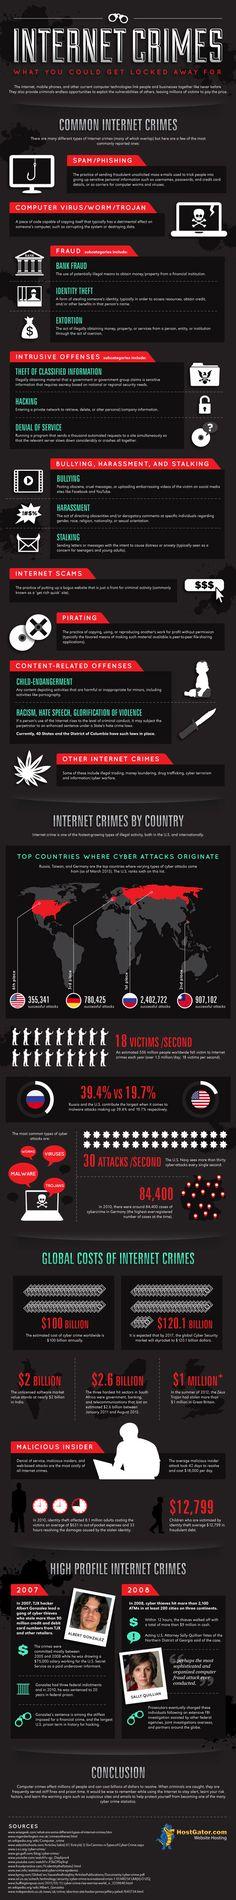 Internet Crimes What